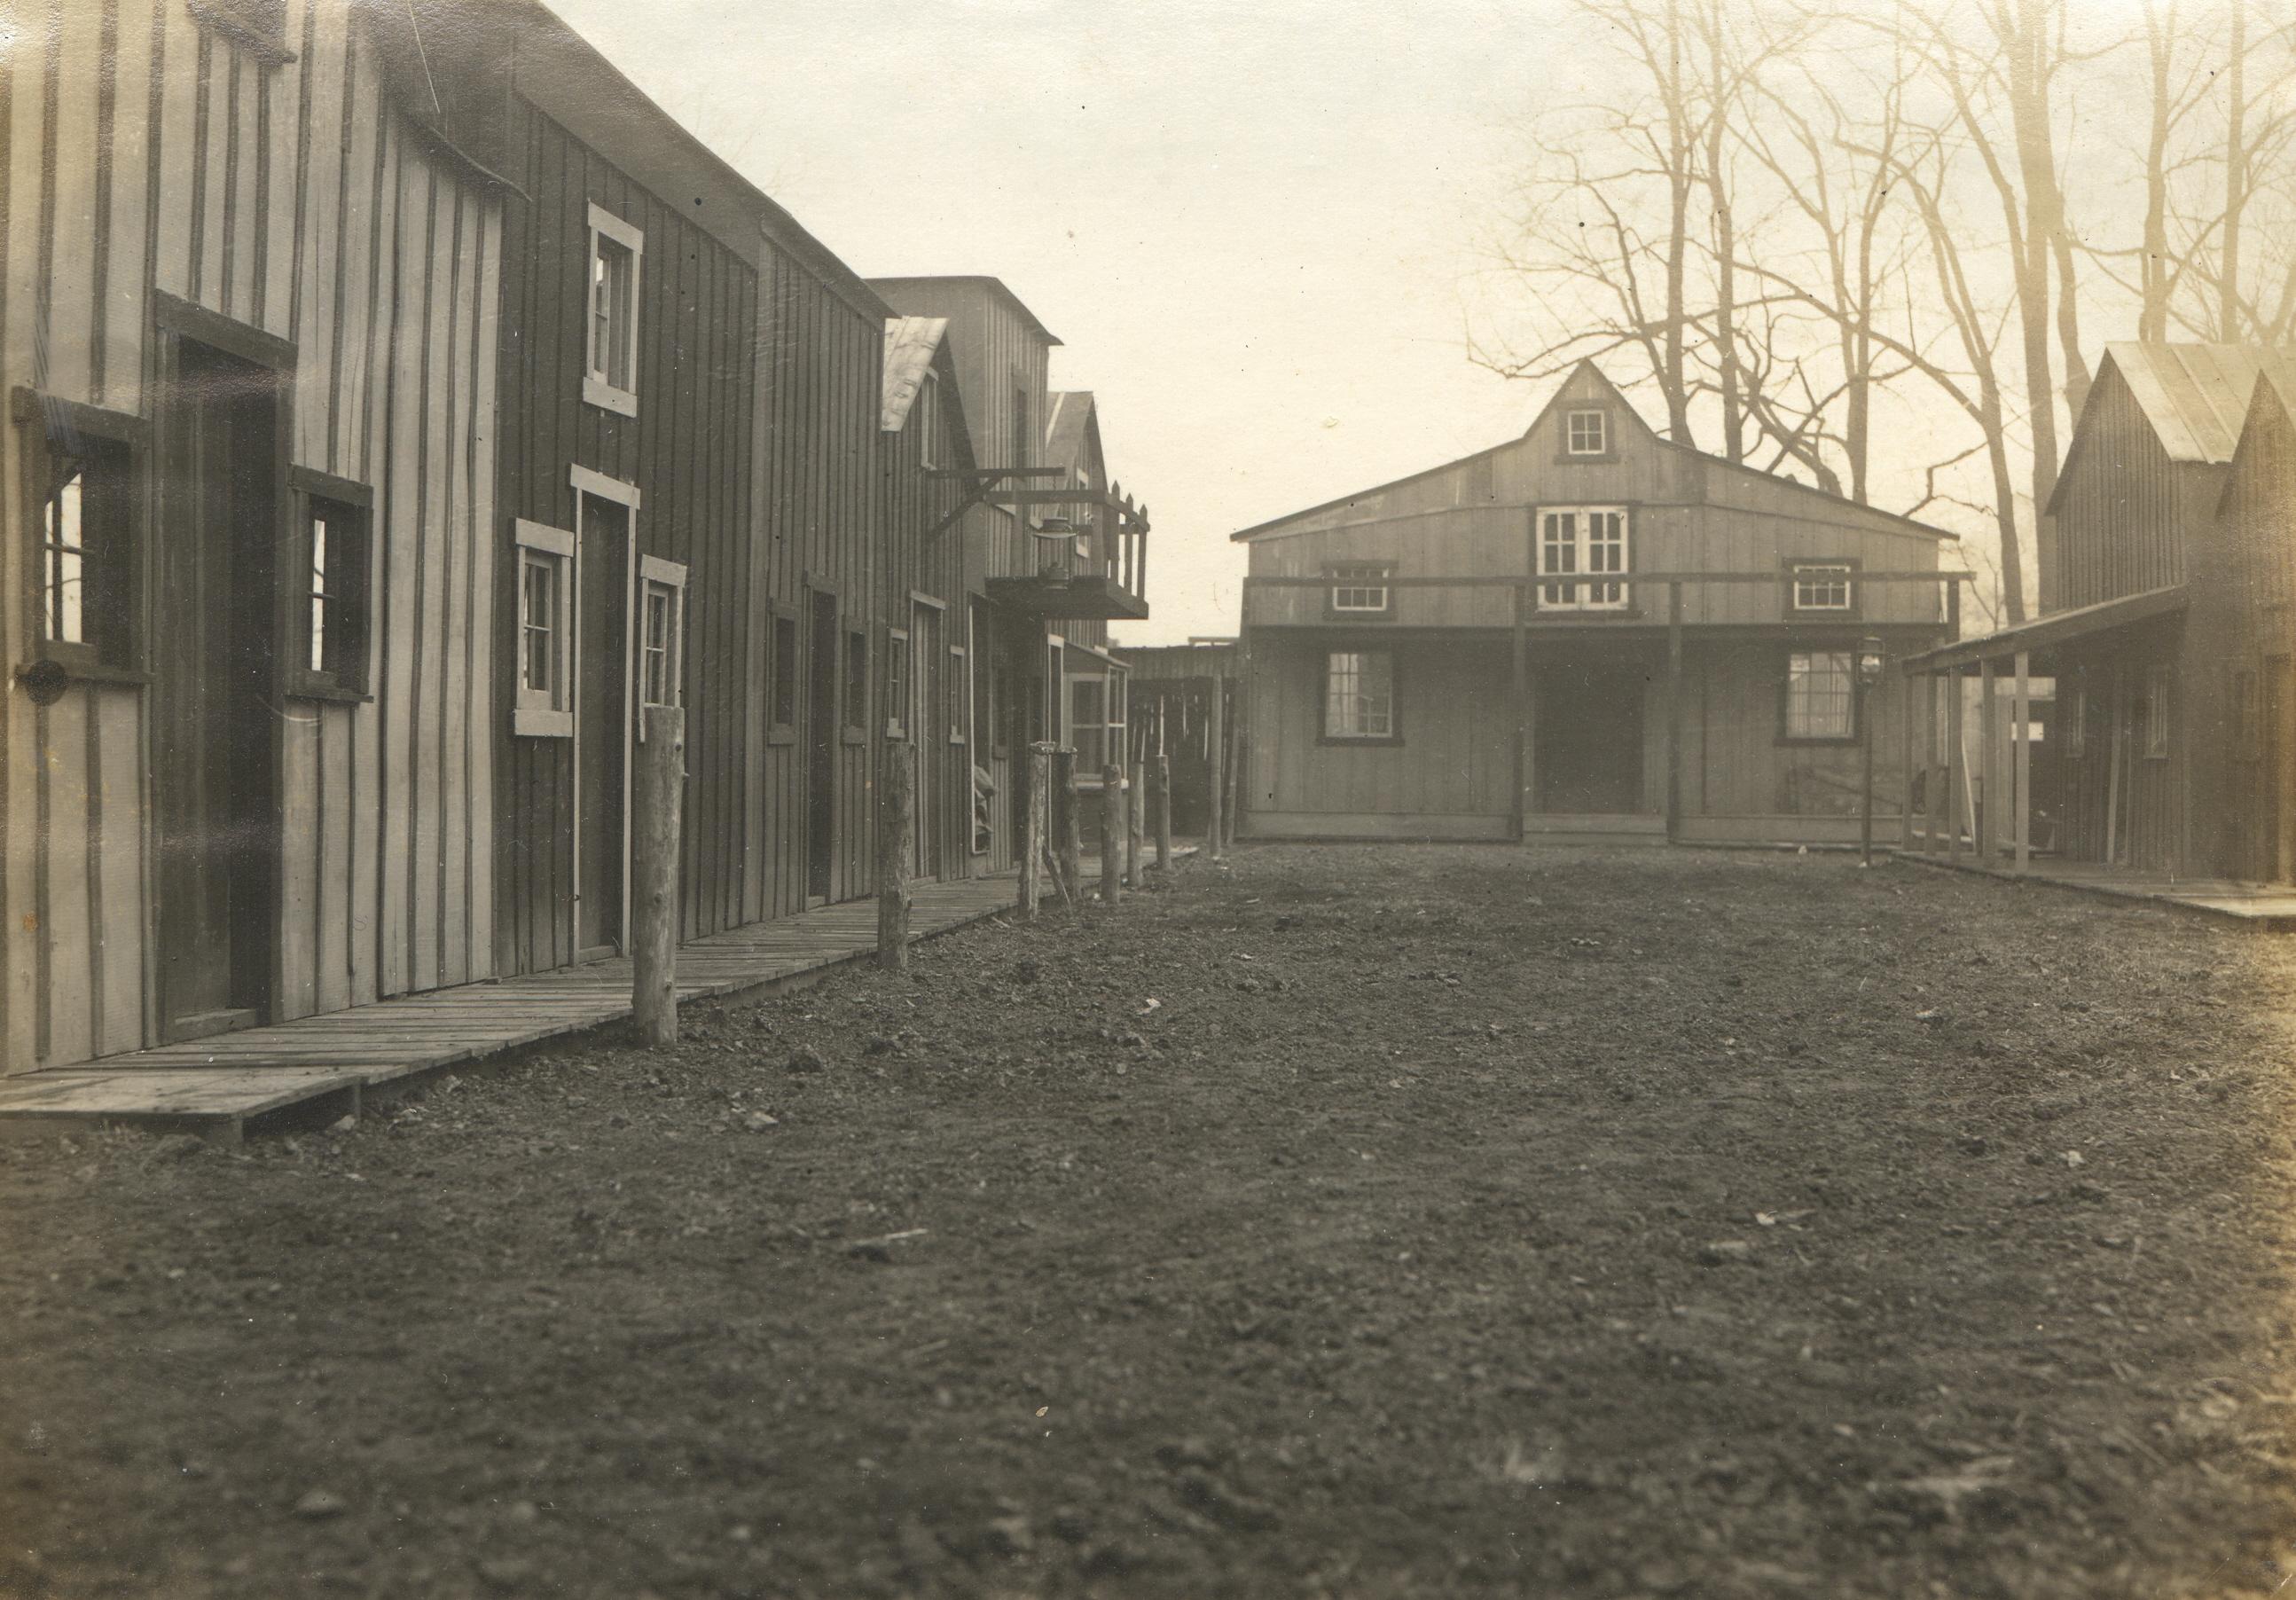 Cowboy Village set